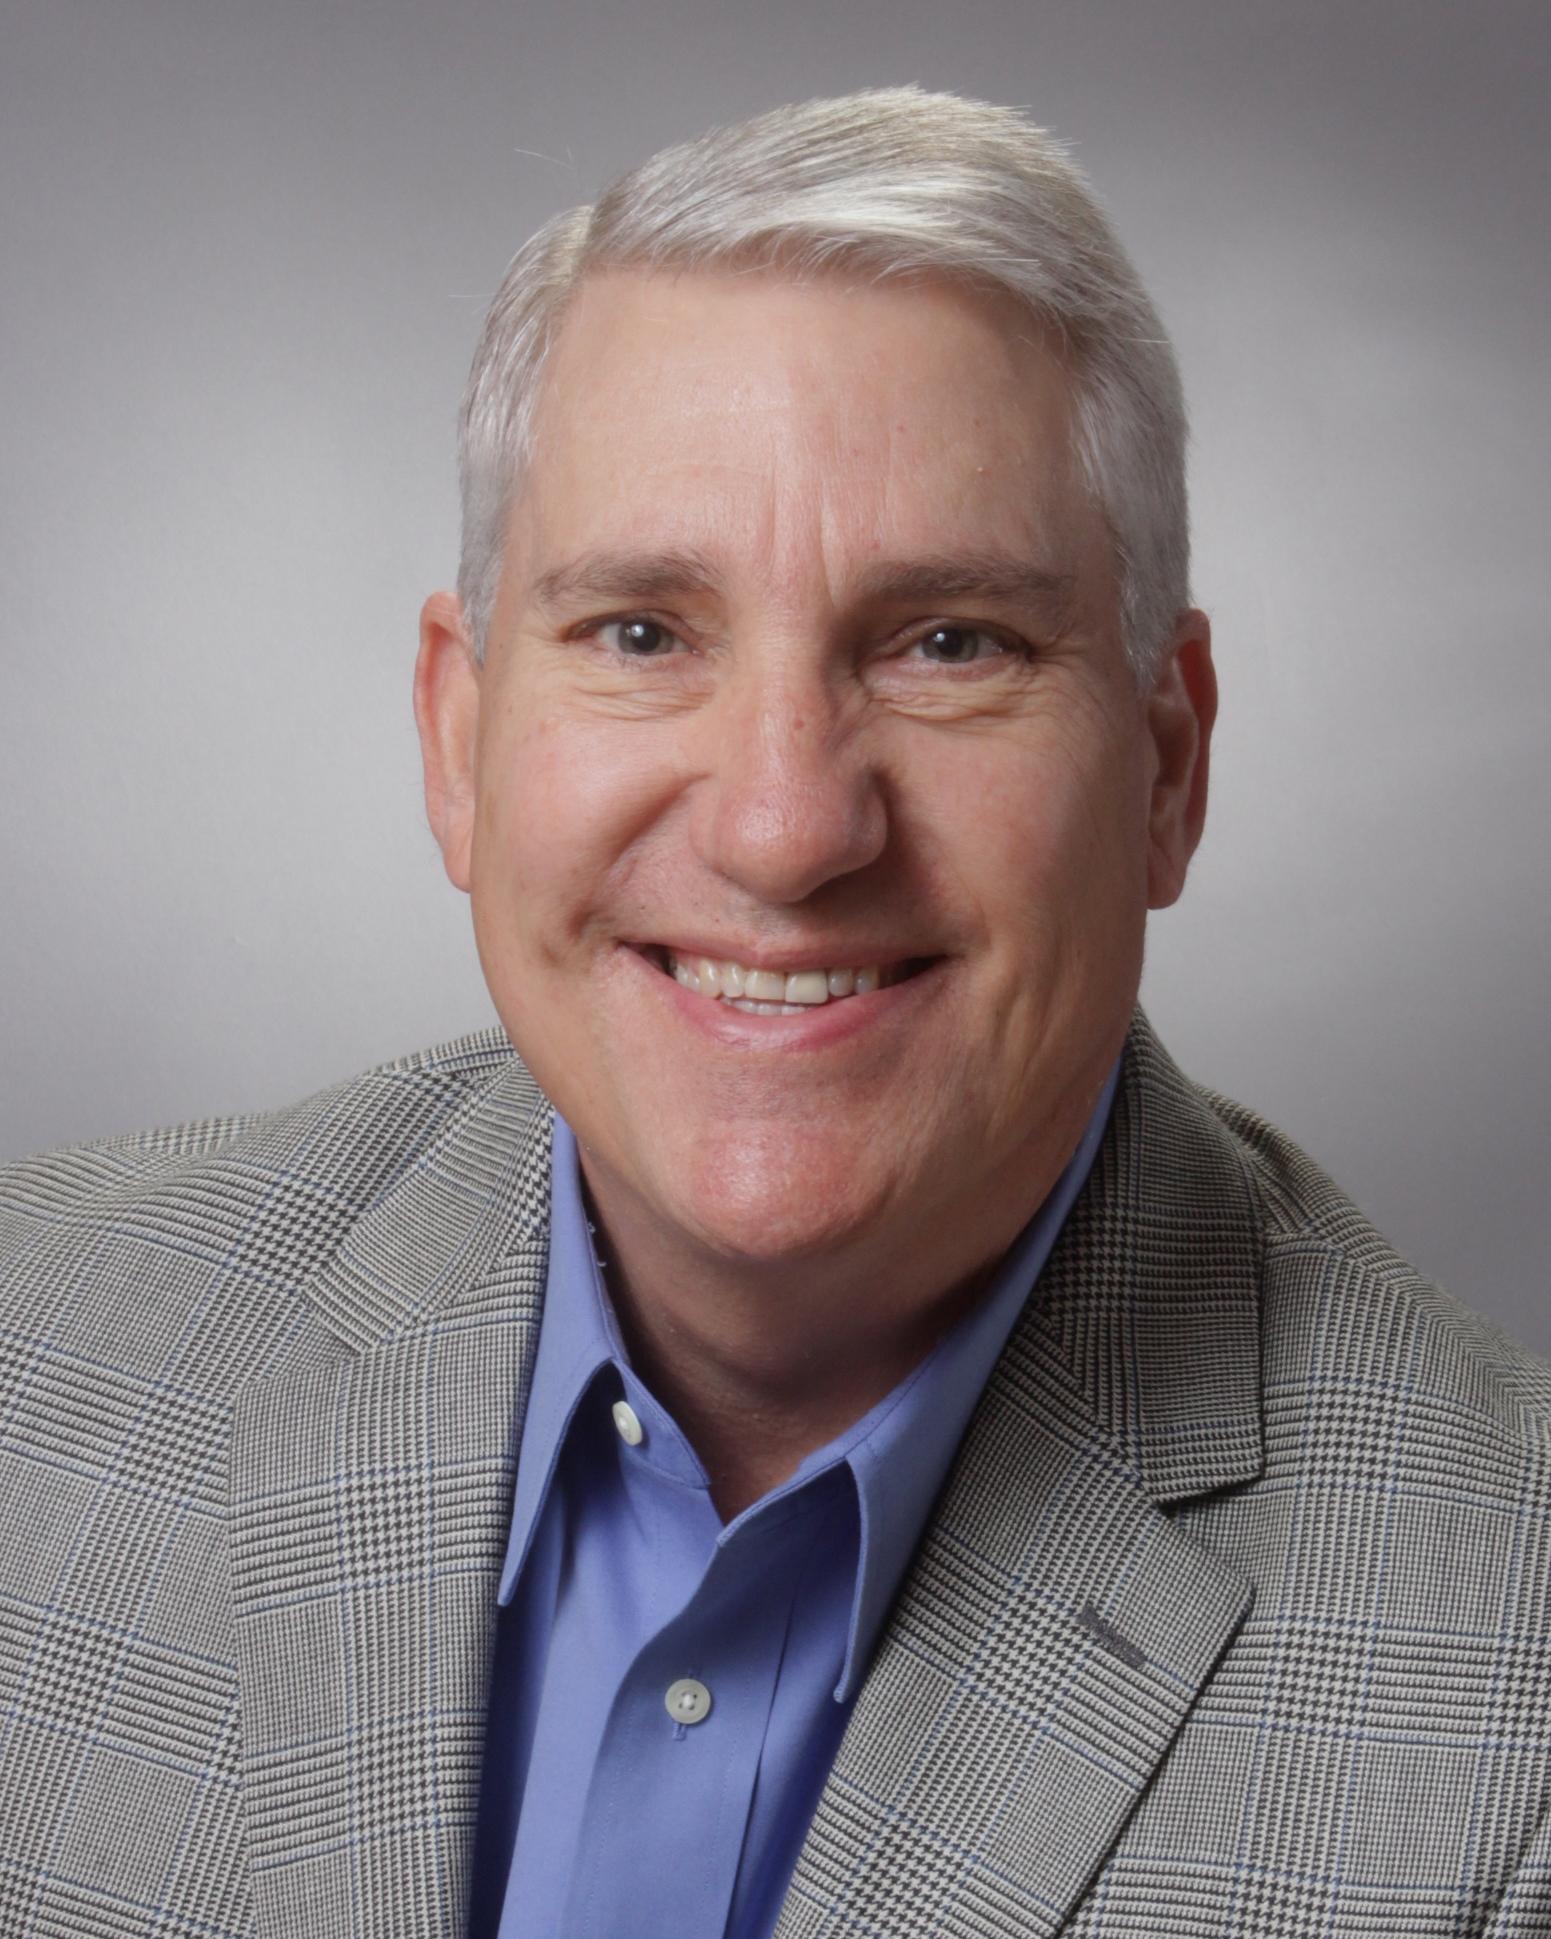 Barry Gleeson